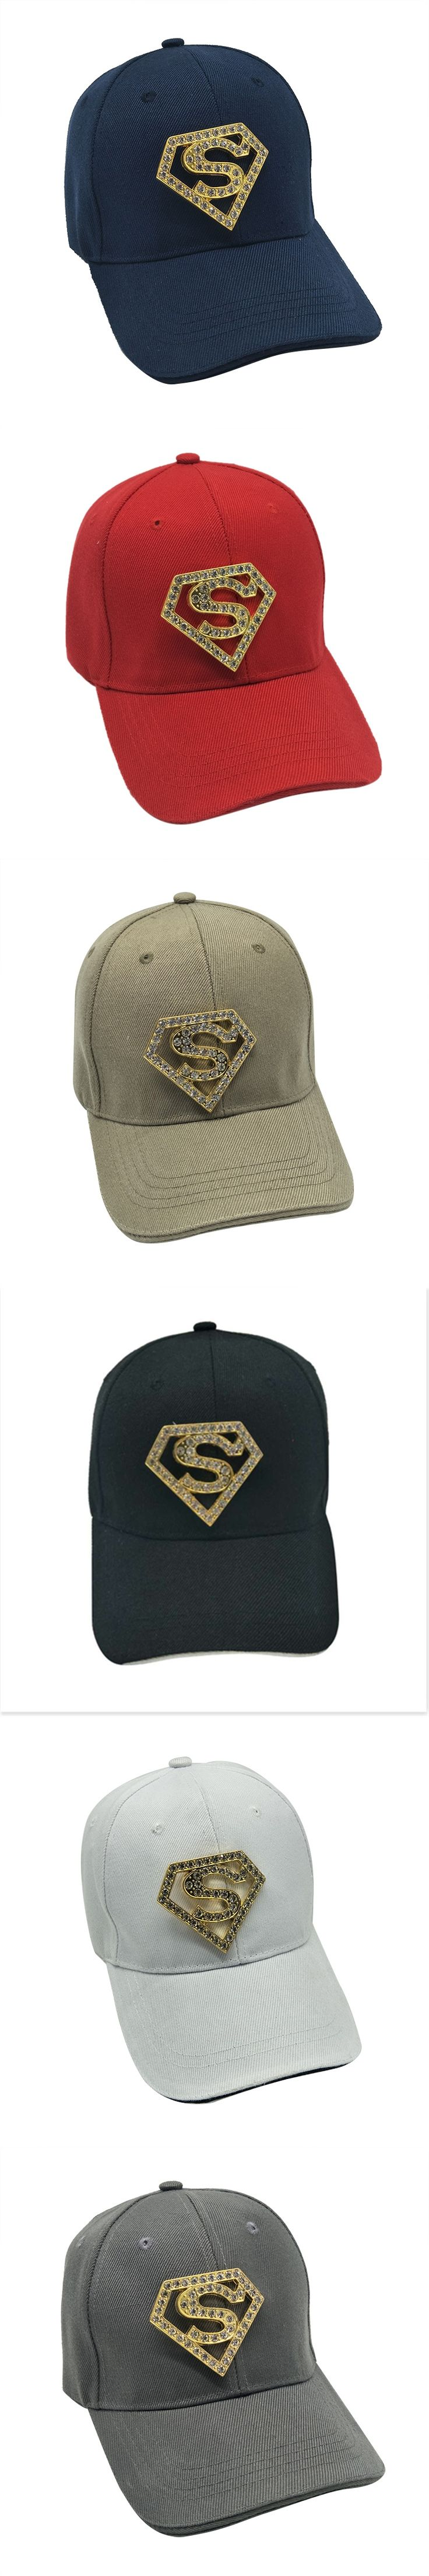 Top Quality Superman Unisex Baseball Hats Snapback Caps Men Outdoor Sun Hat Sports Cap Diamond Decoration Bone casquette homme